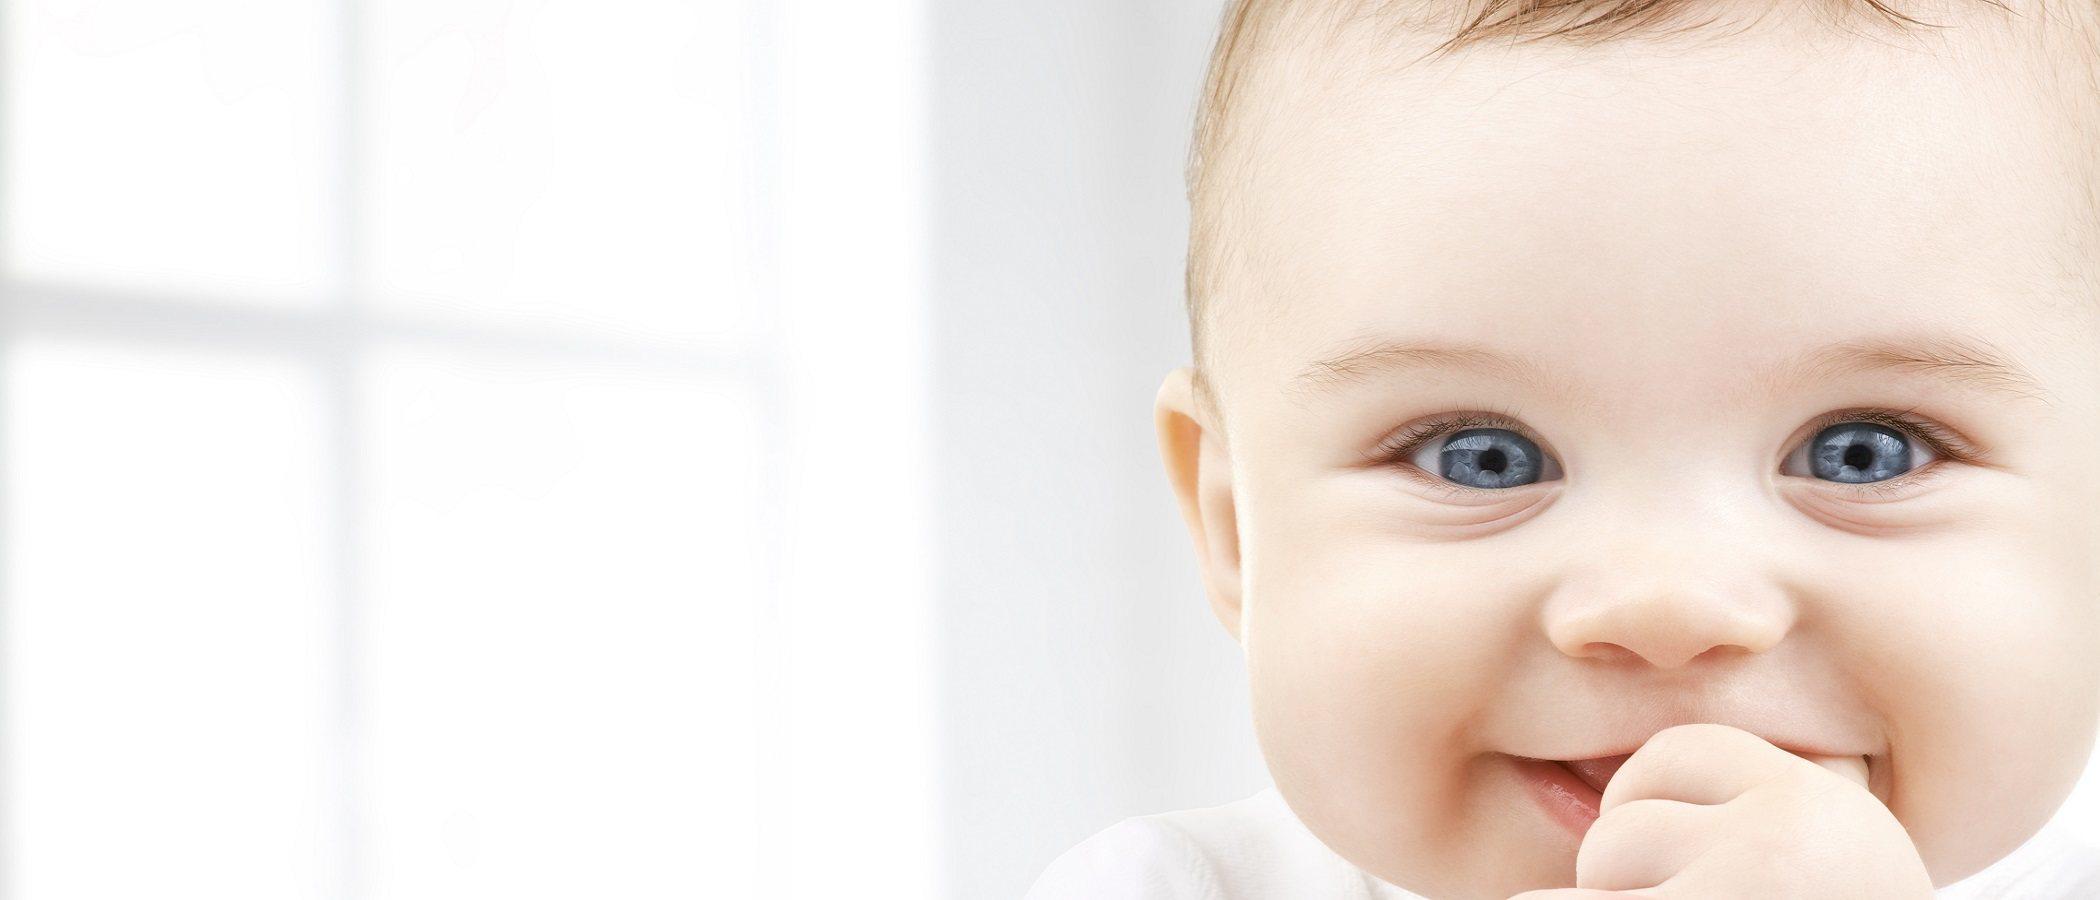 50 nombres para bebés que nunca has escuchado